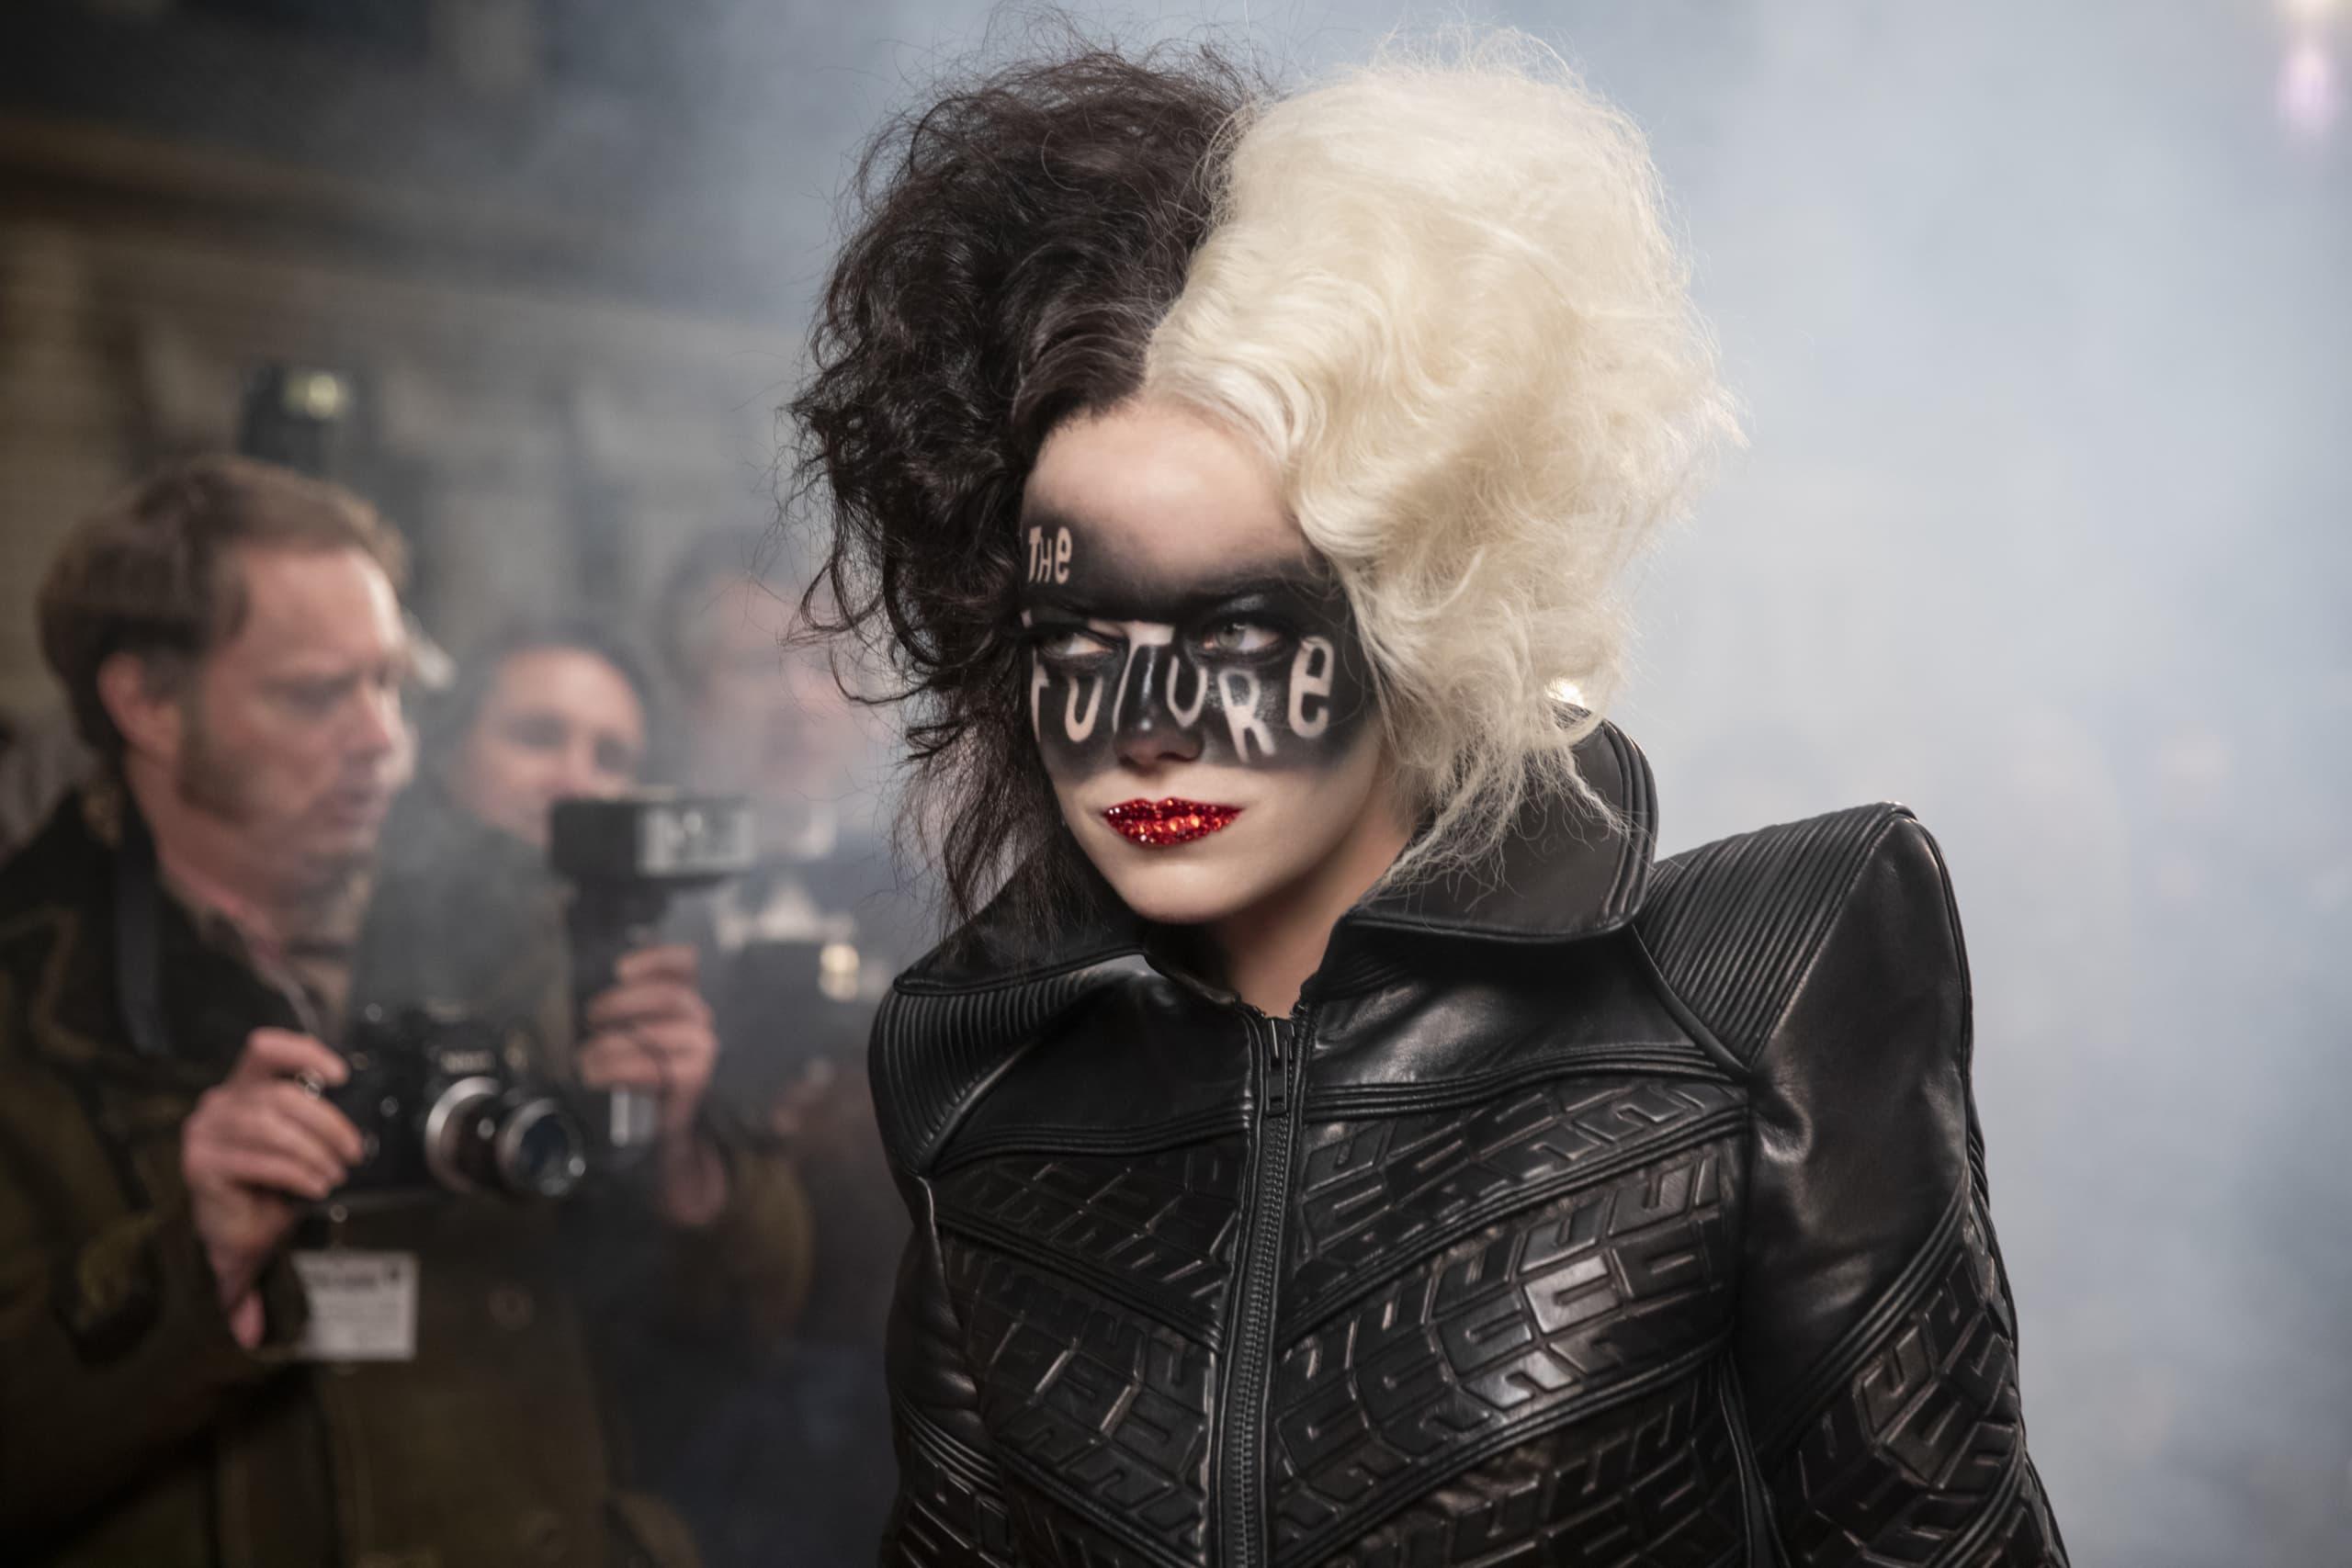 Cruella Makeup Design The Future